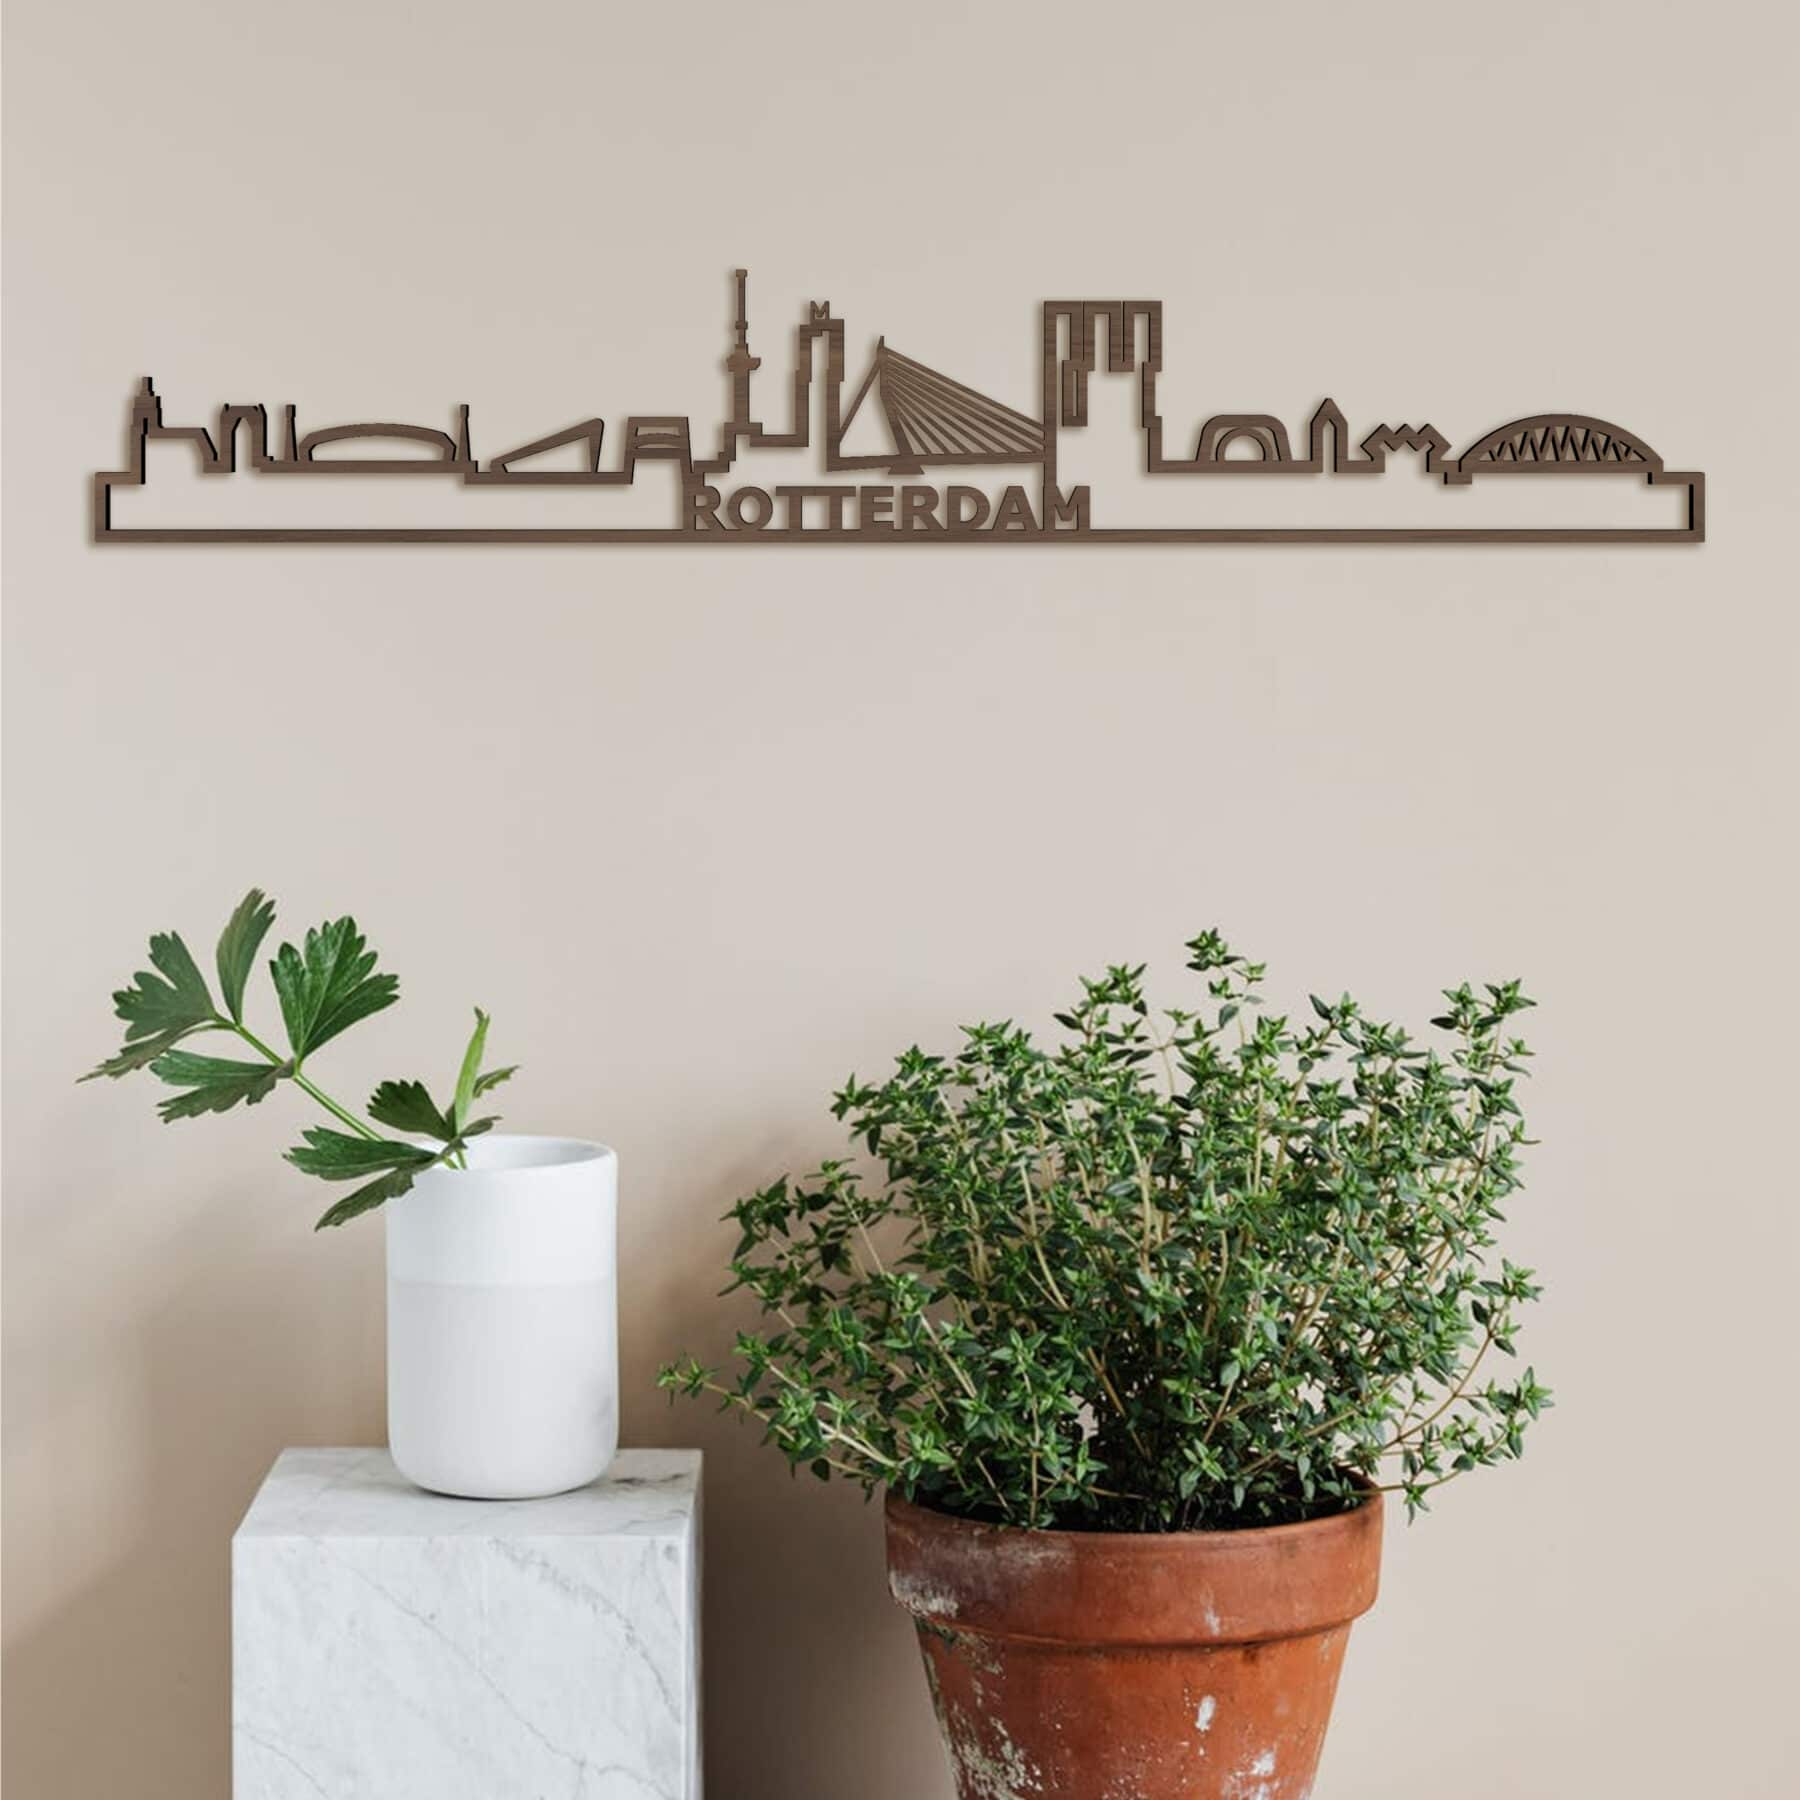 Skyline Rotterdam noten